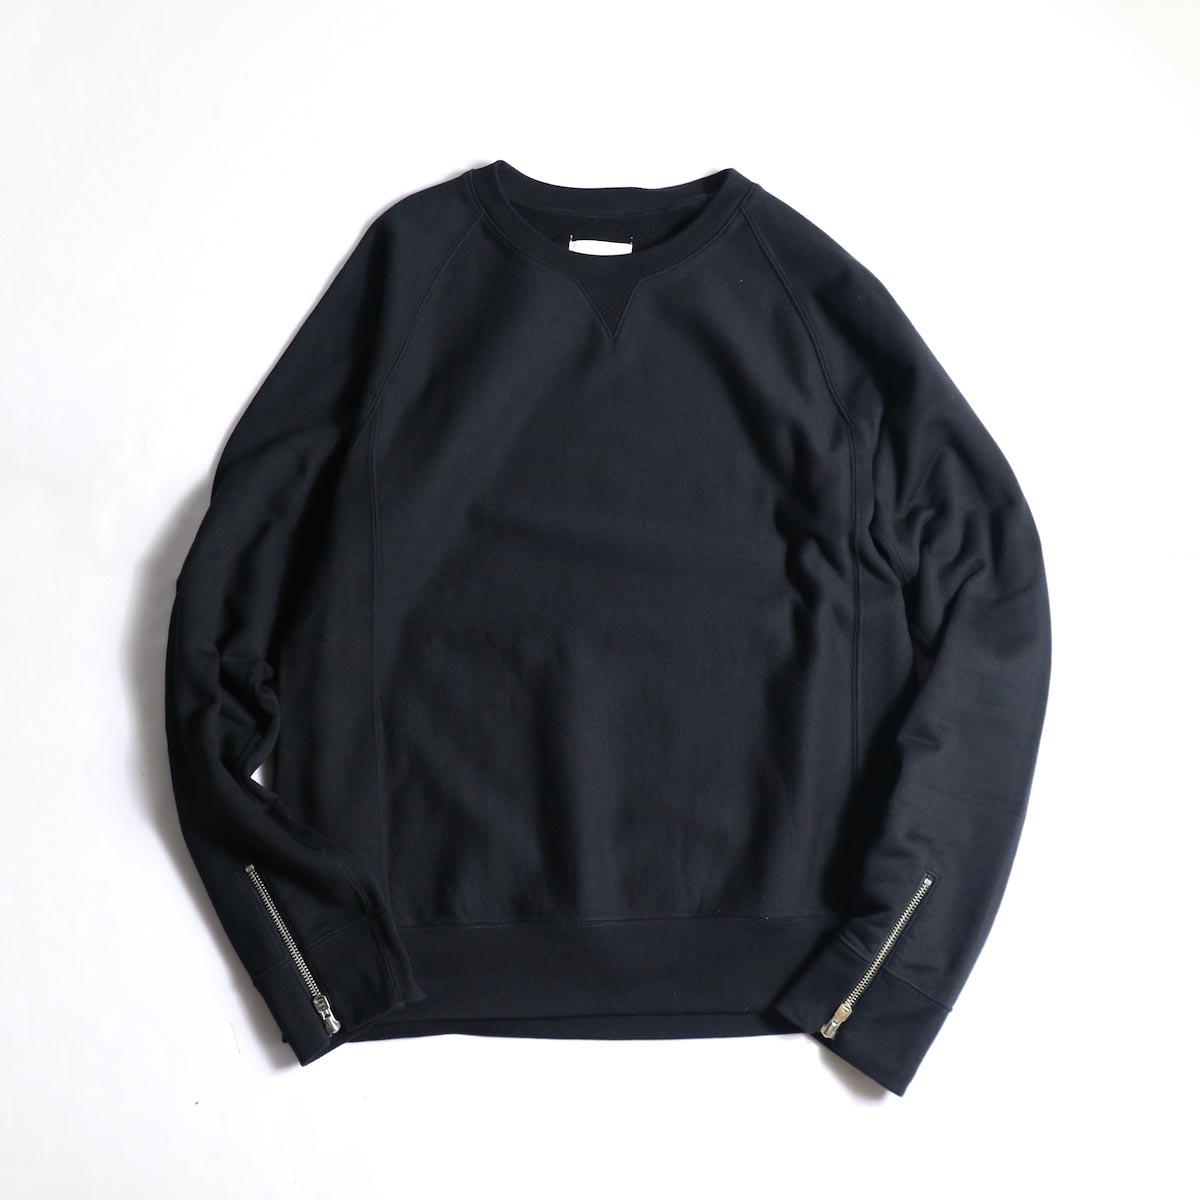 The Soloist / sc.0013bAW20 crew neck sweatshirt. (Black)